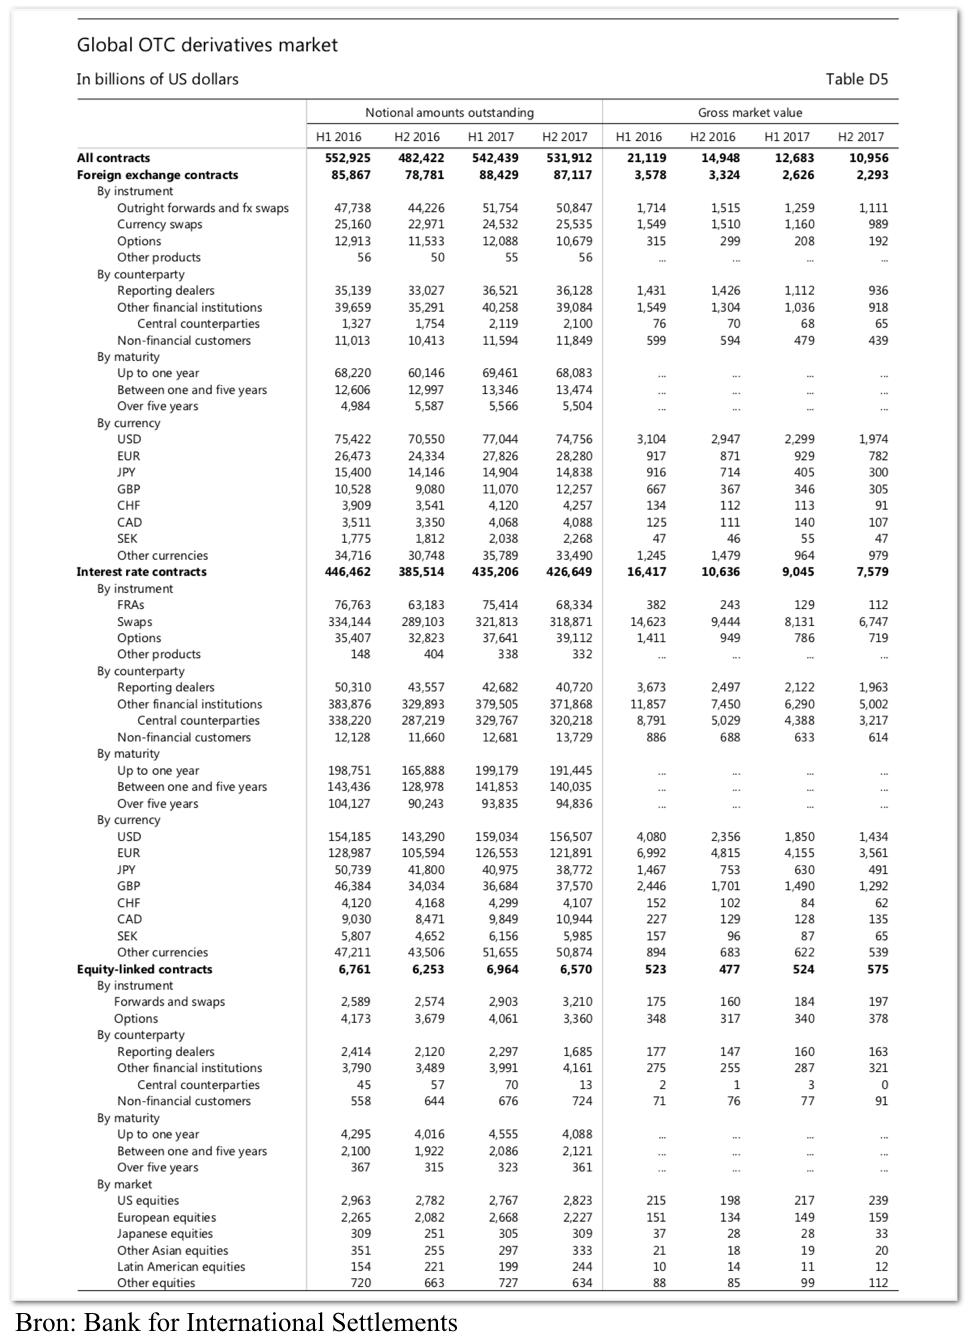 Globale derivaten markt volgens Bank of International Settlements